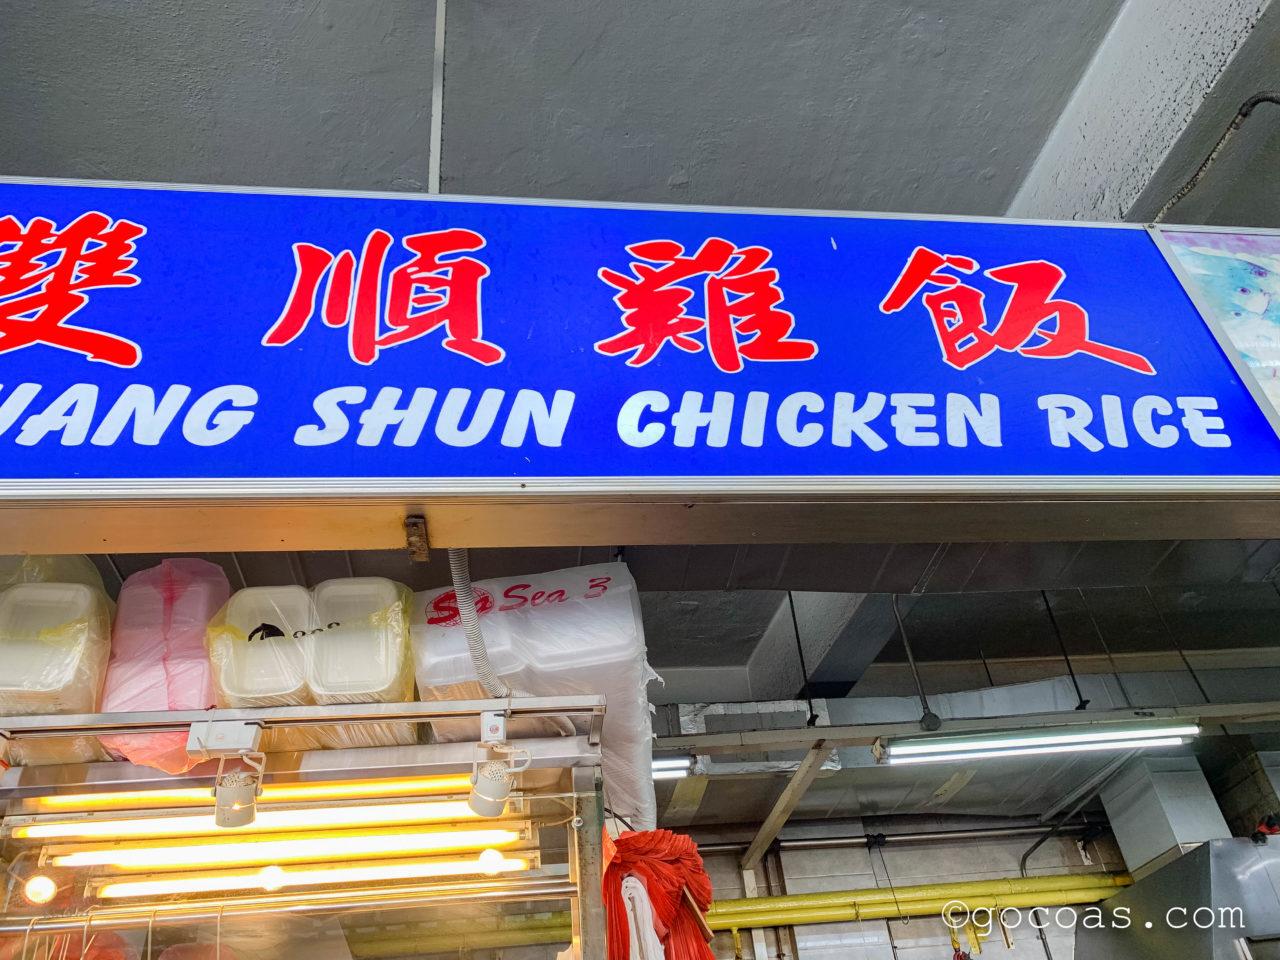 Shuang Shun Chicken Riceの看板